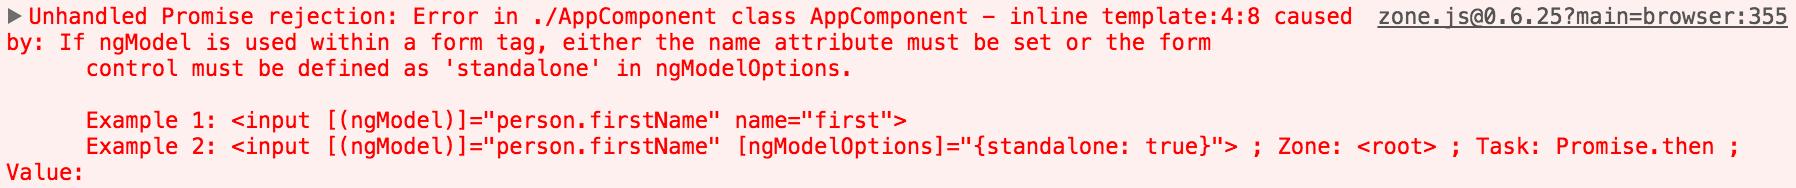 Name Attribute Error